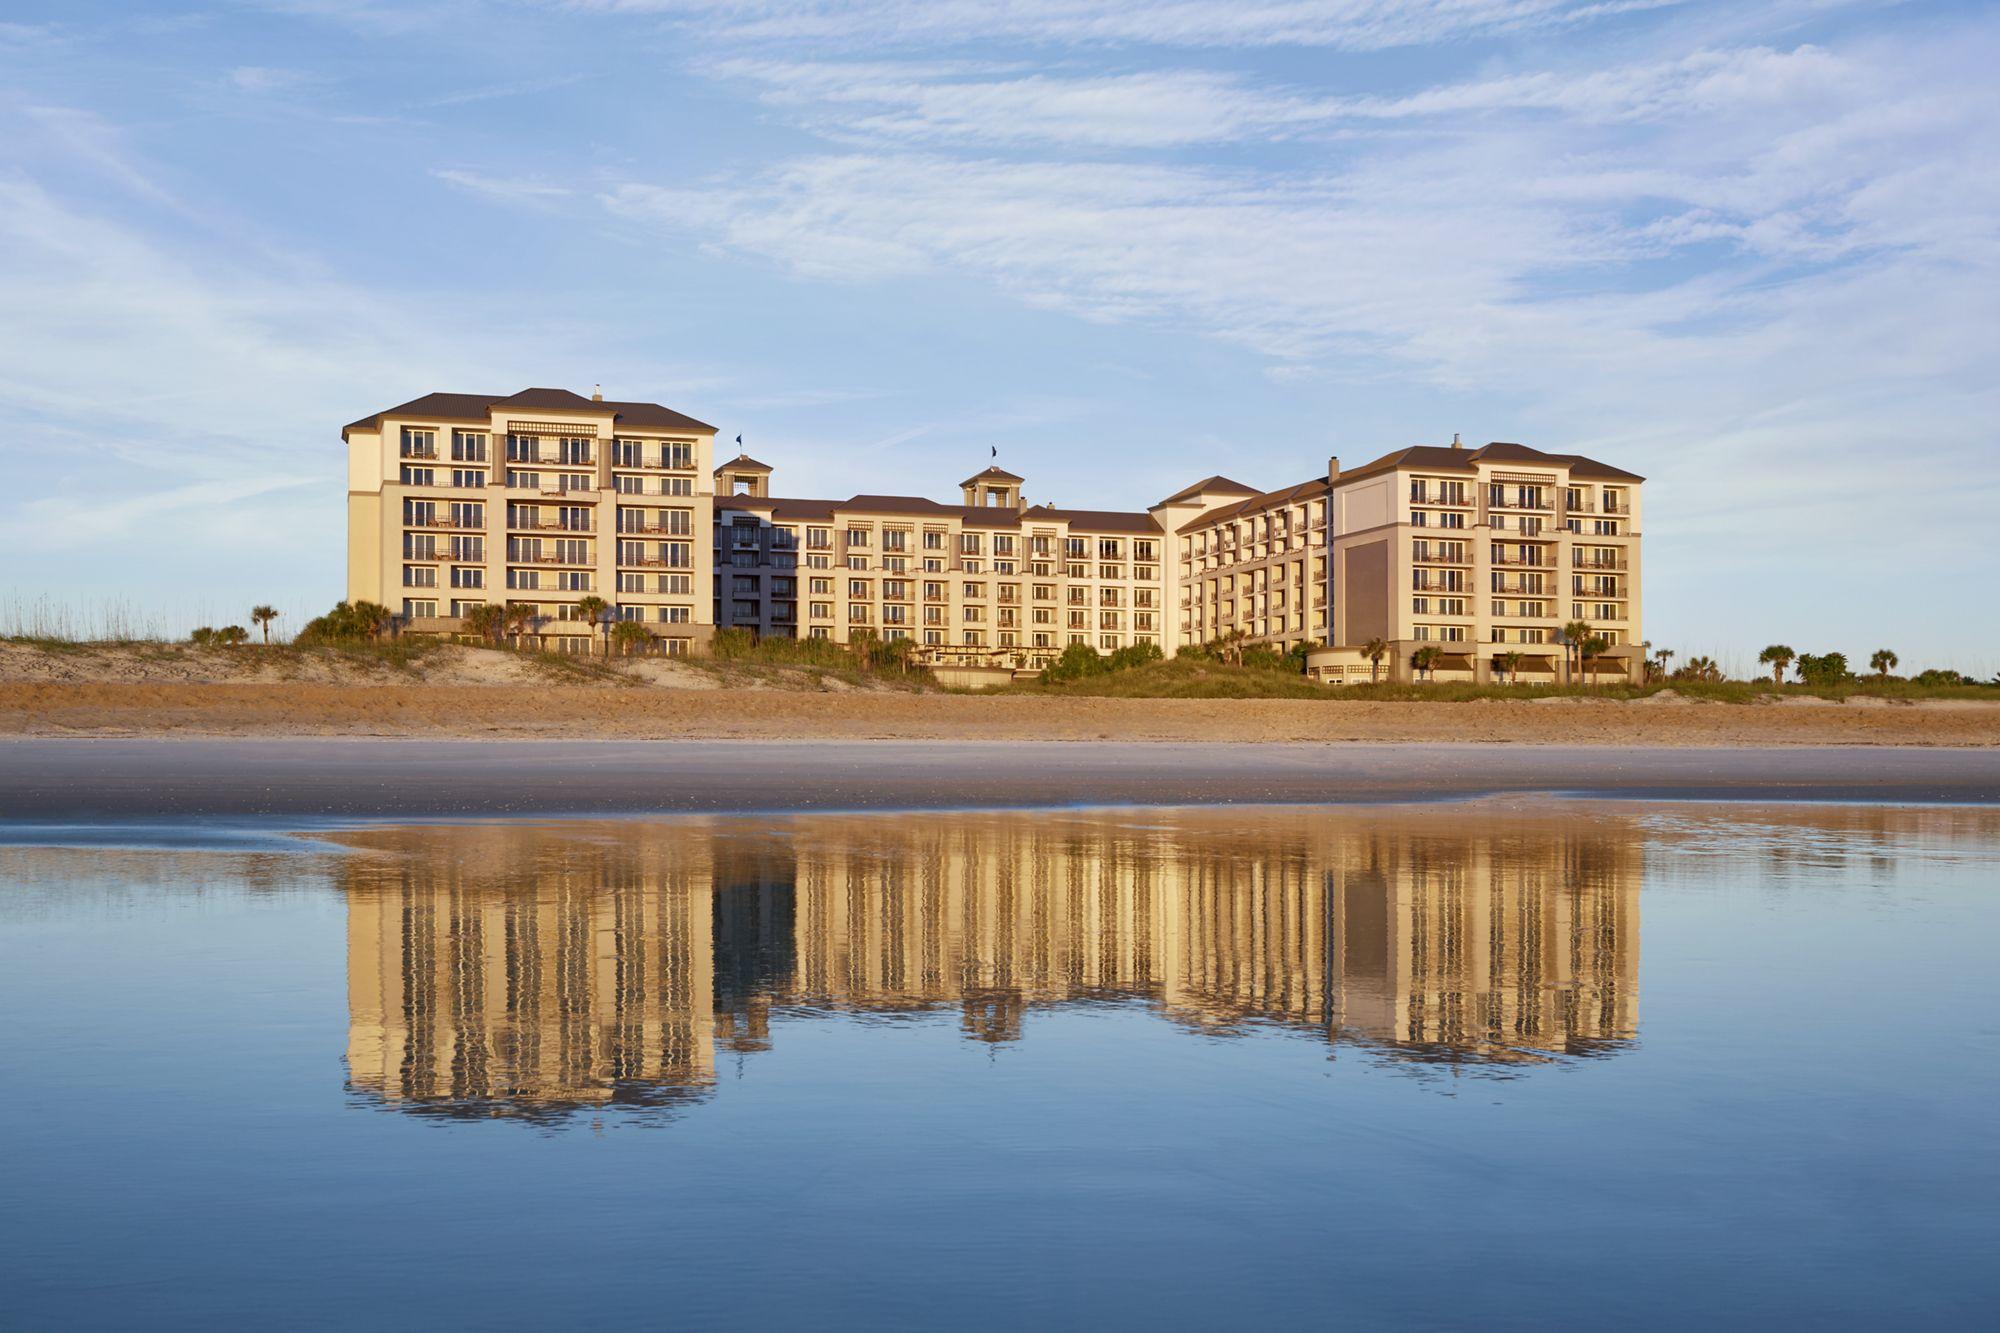 The Ritz-Carlton, Amelia Island, Fernandina Beach FL